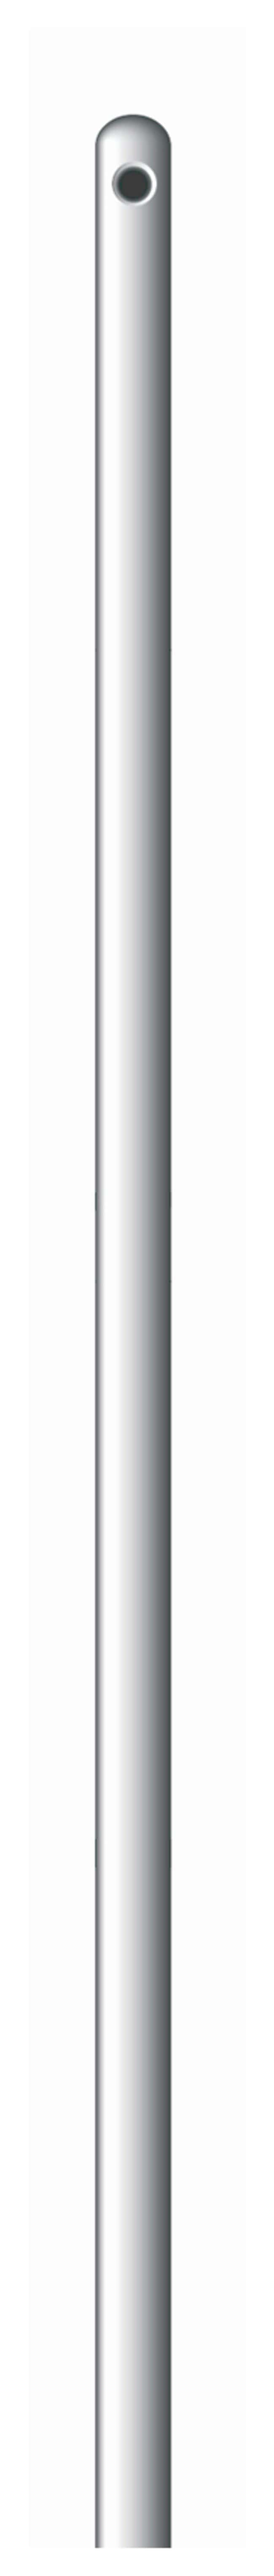 Trajan™Replaceable Luer Lock Needles: Side Hole